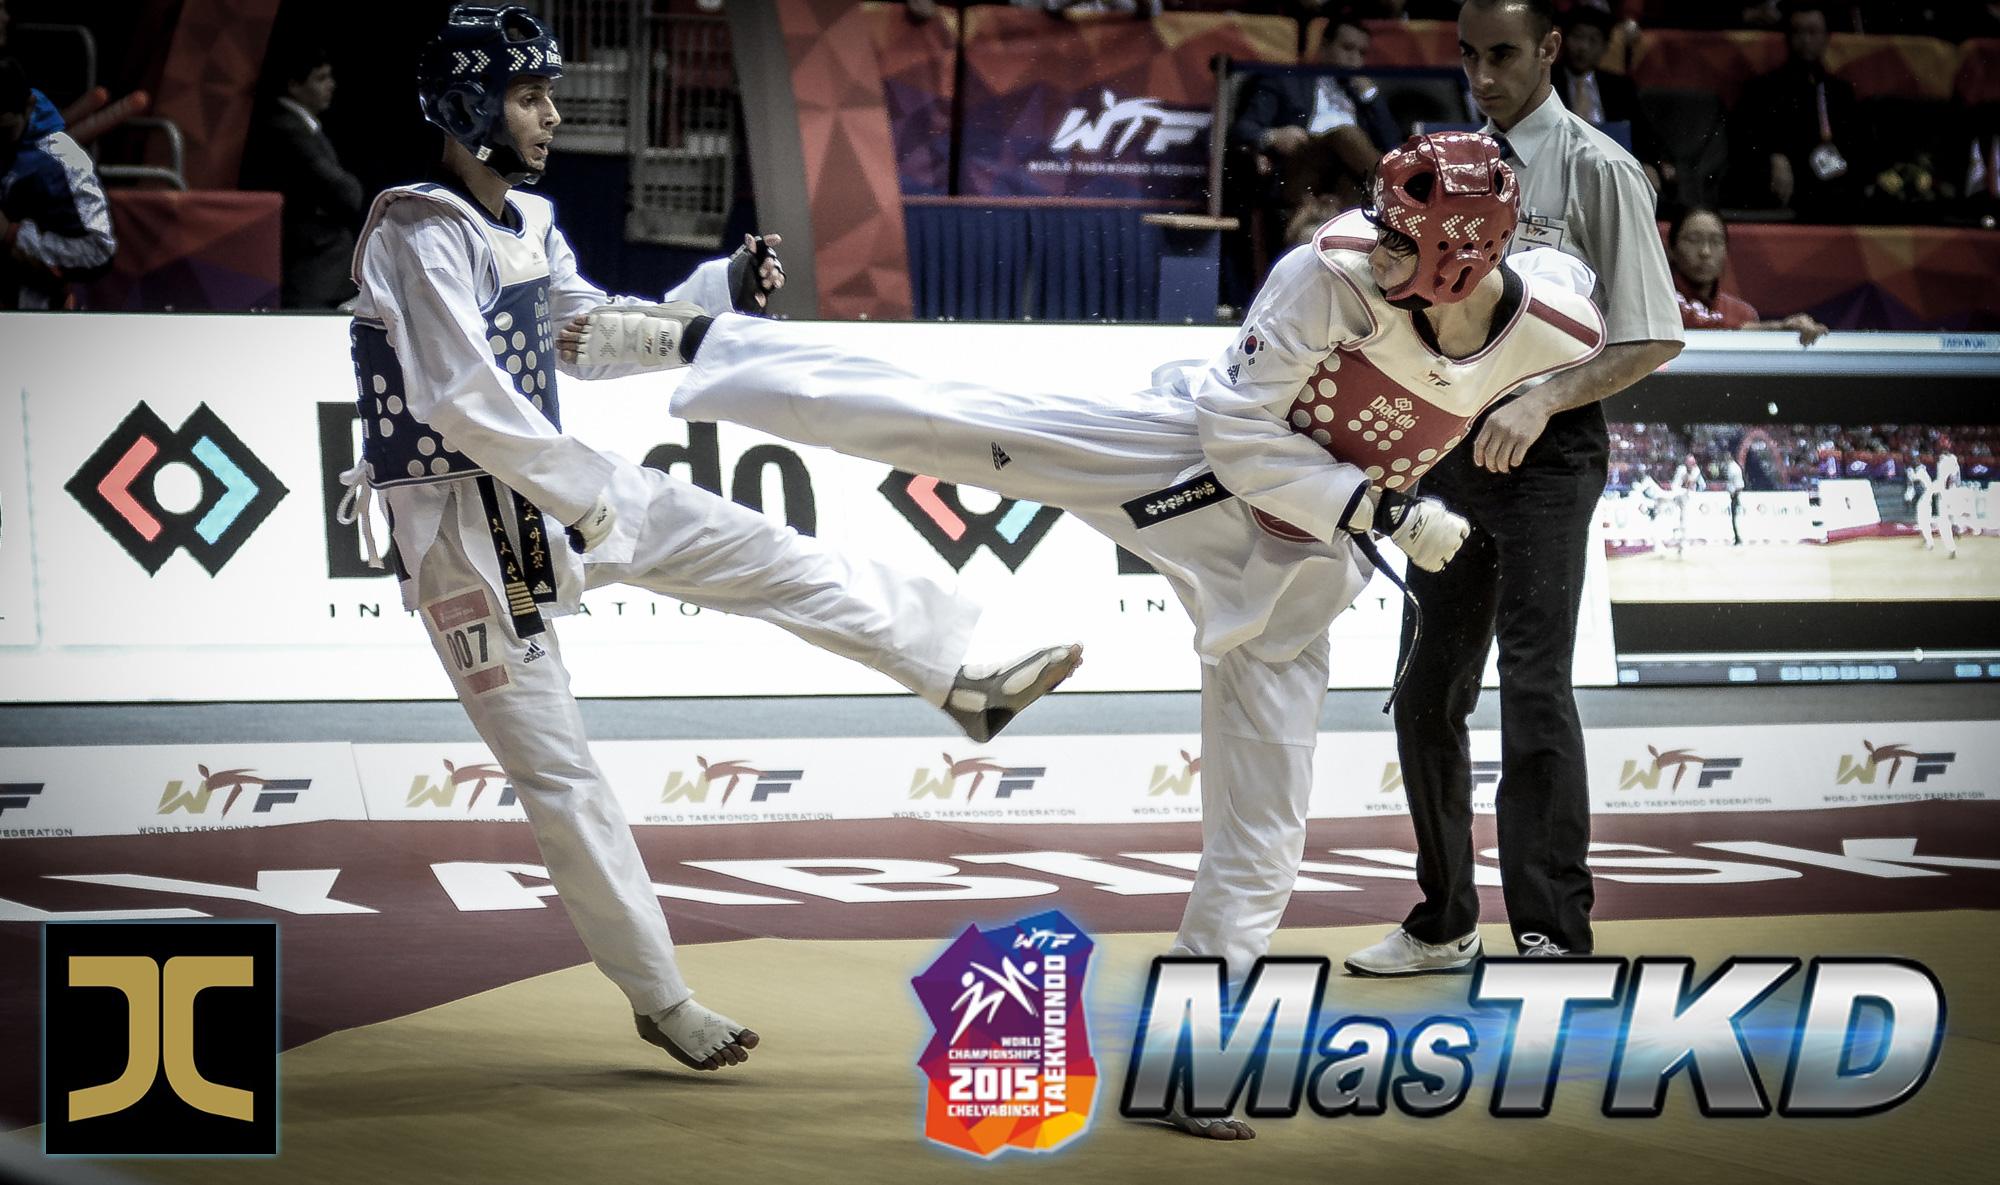 03_JCalicu-Mundial-Taekwondo-Mejores-Imagenes_DSC0237